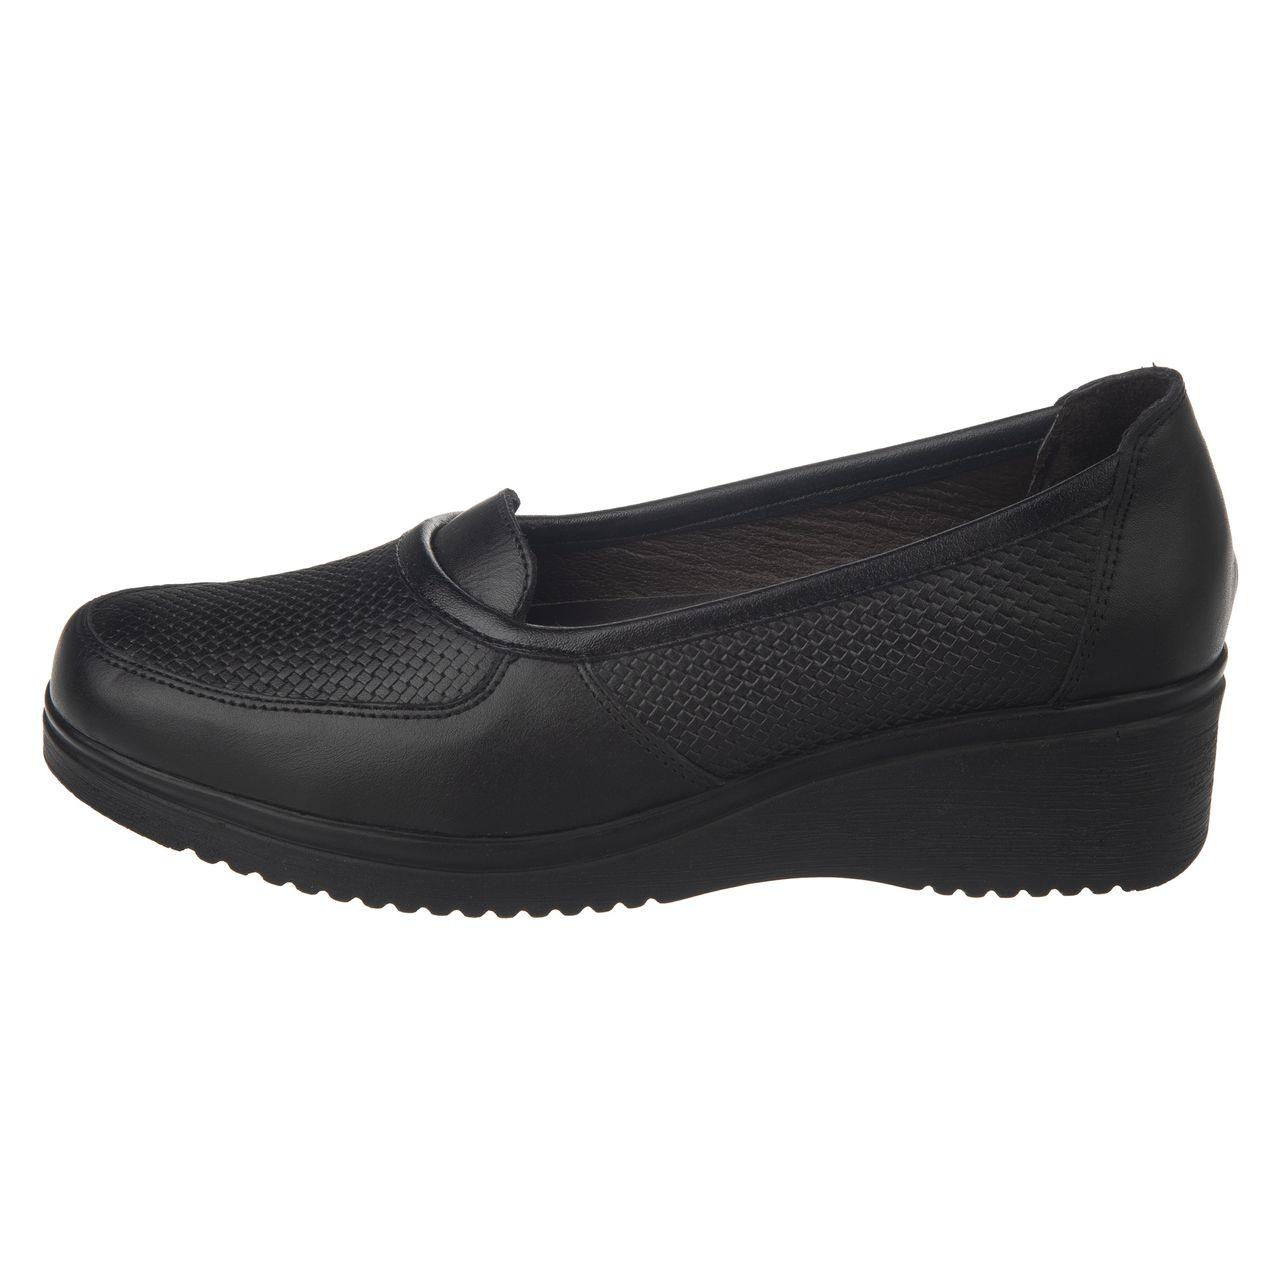 کفش روزمره زنانه شیفر مدل 5276A-101